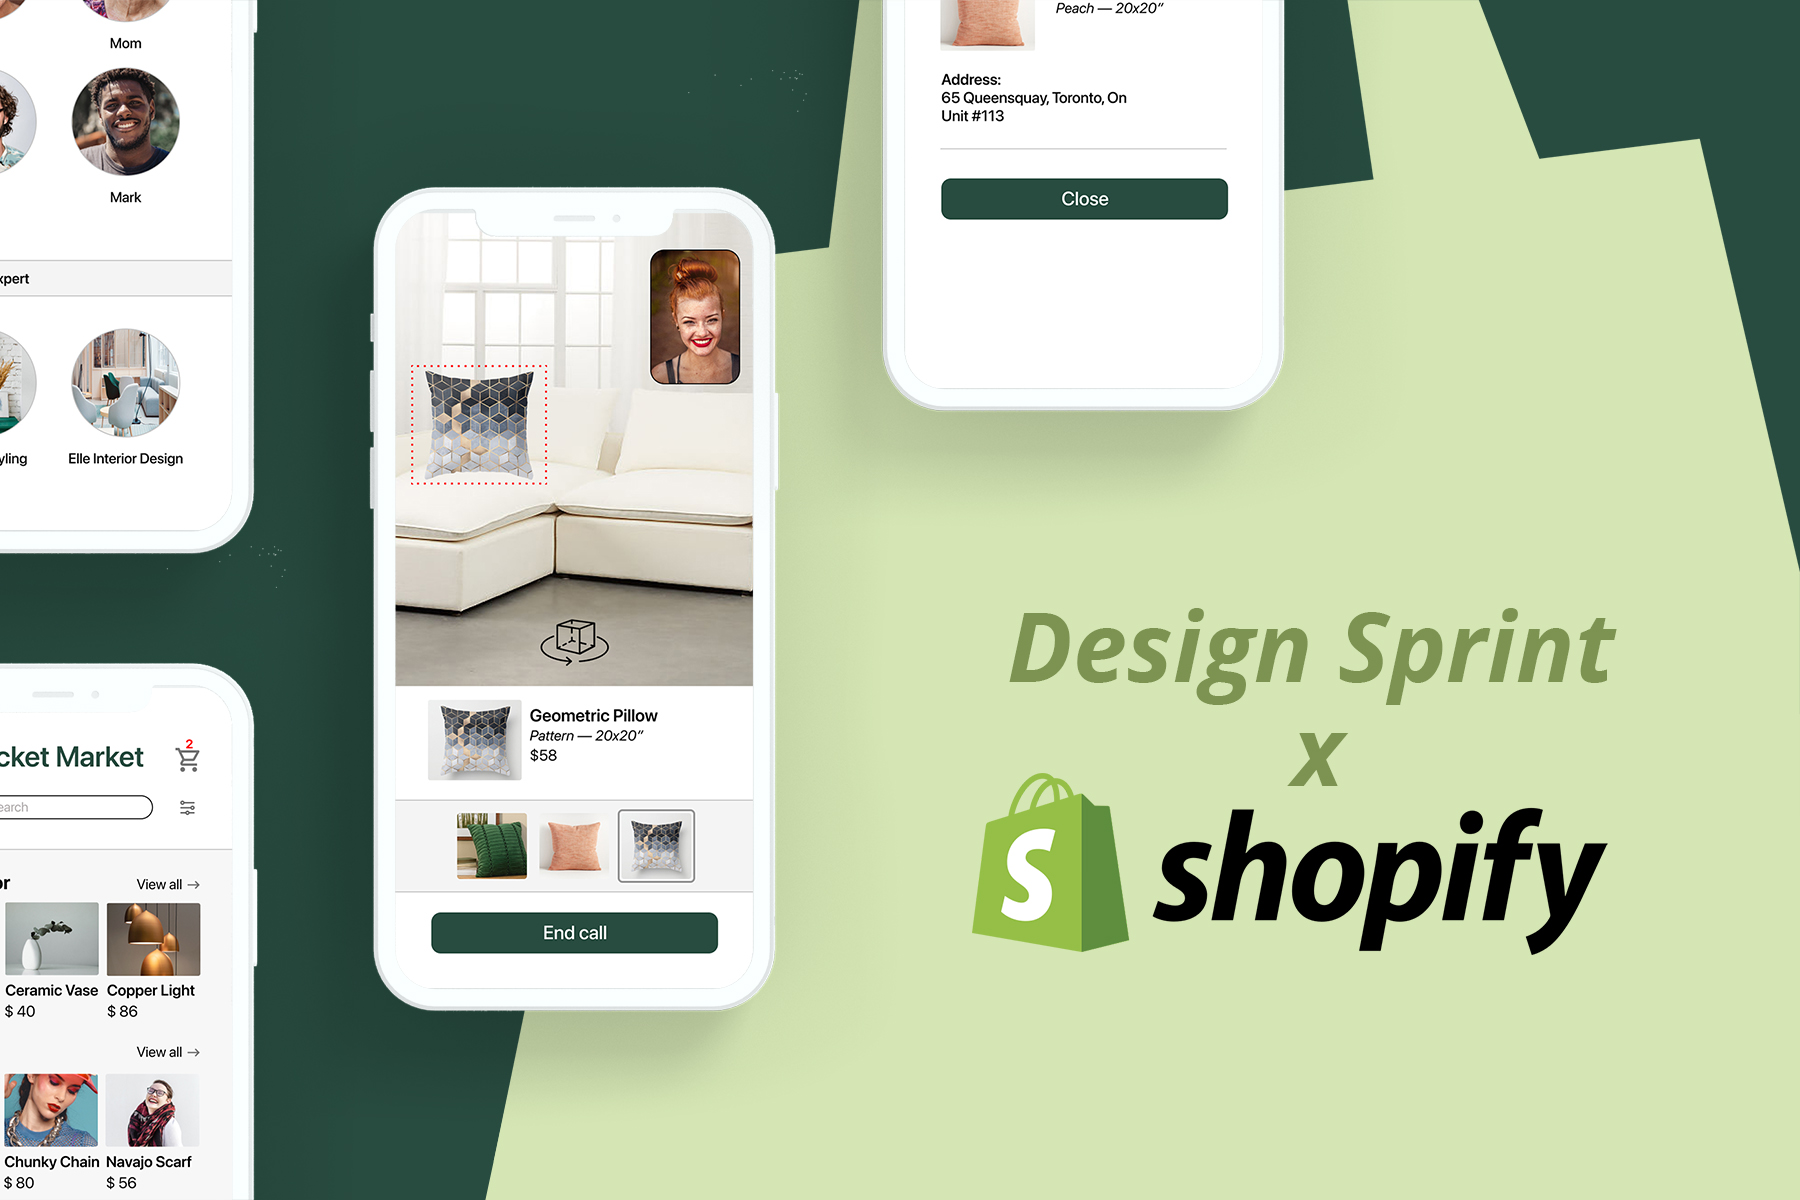 Design sprint x Shopify